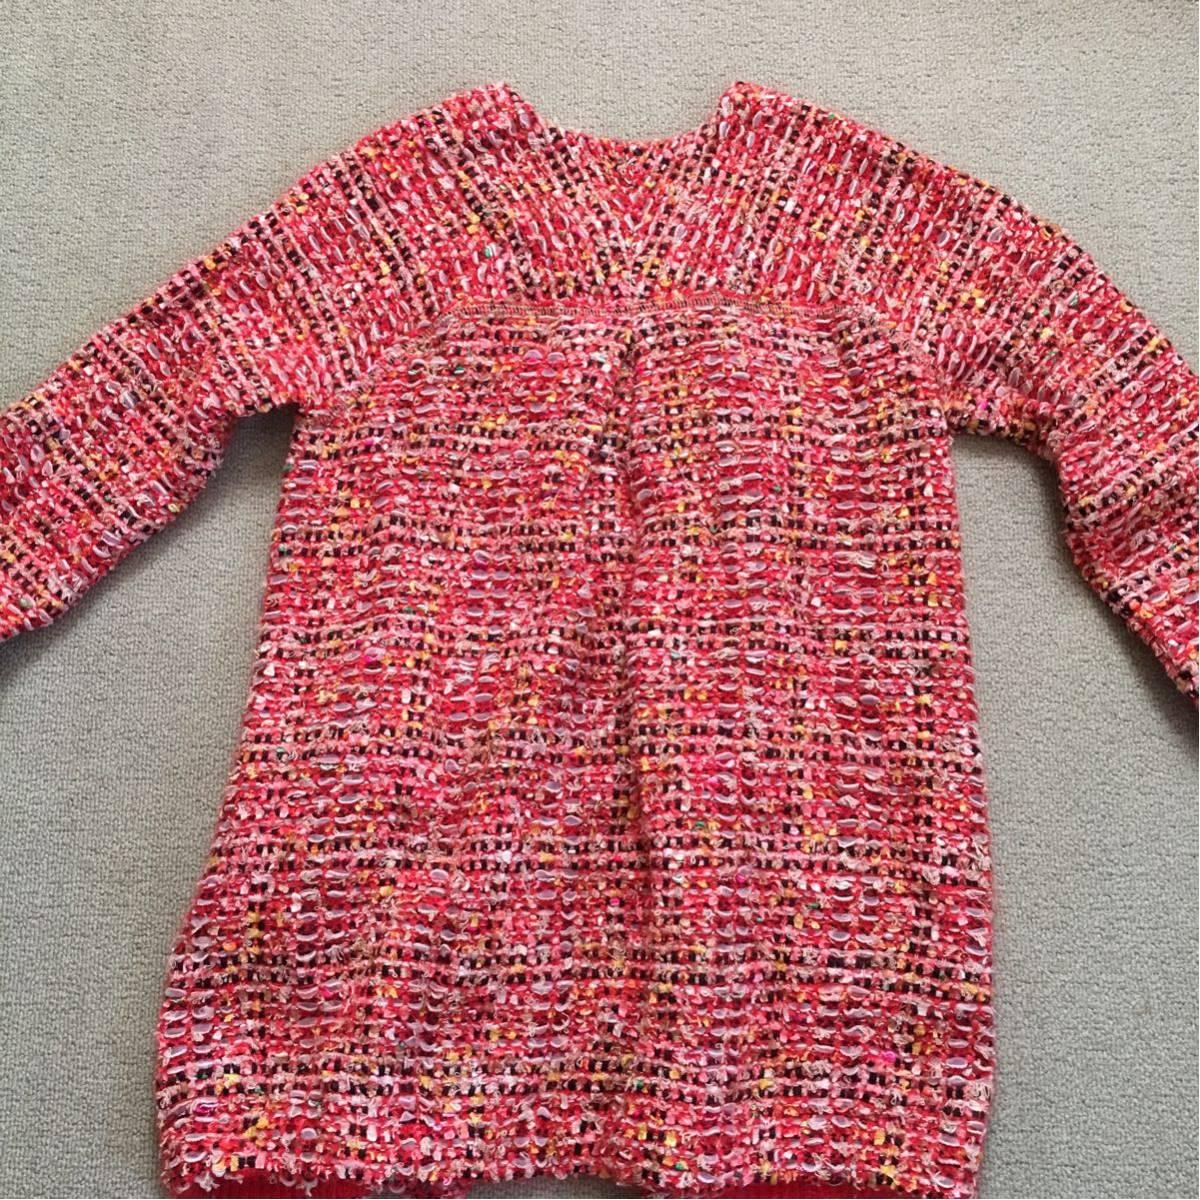 k 美品 Coohem(コーヘン) 個性的なツイードコート 赤系 36サイズ 可愛いジャケットコート_画像10